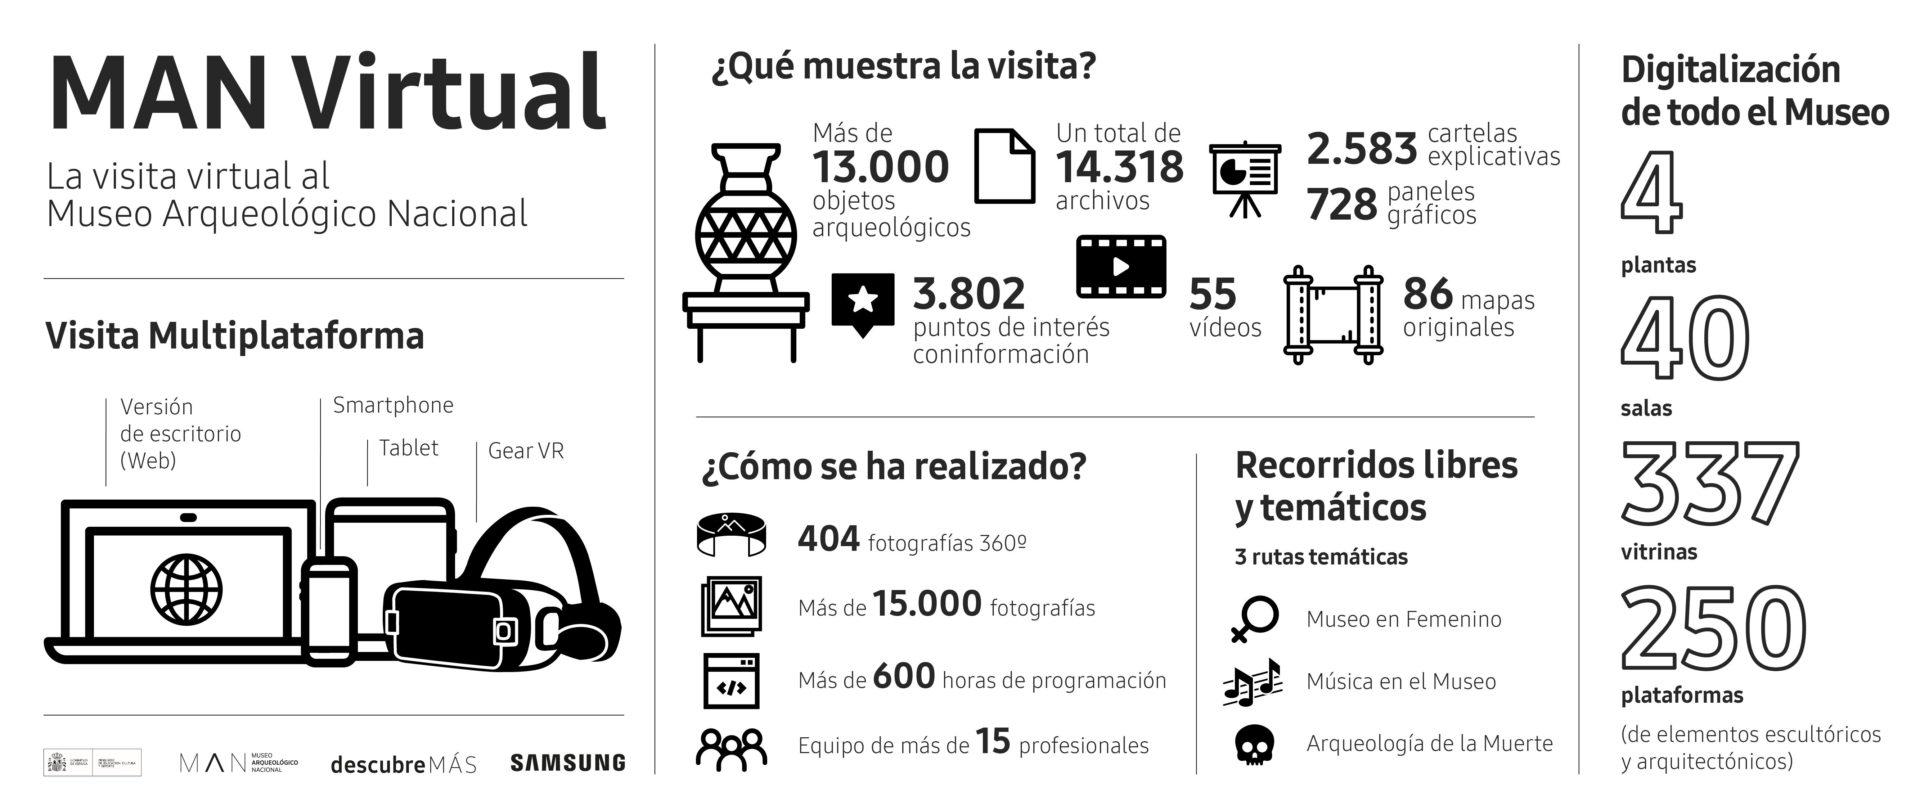 Visita Virtual - Museo Arqueológico Nacional